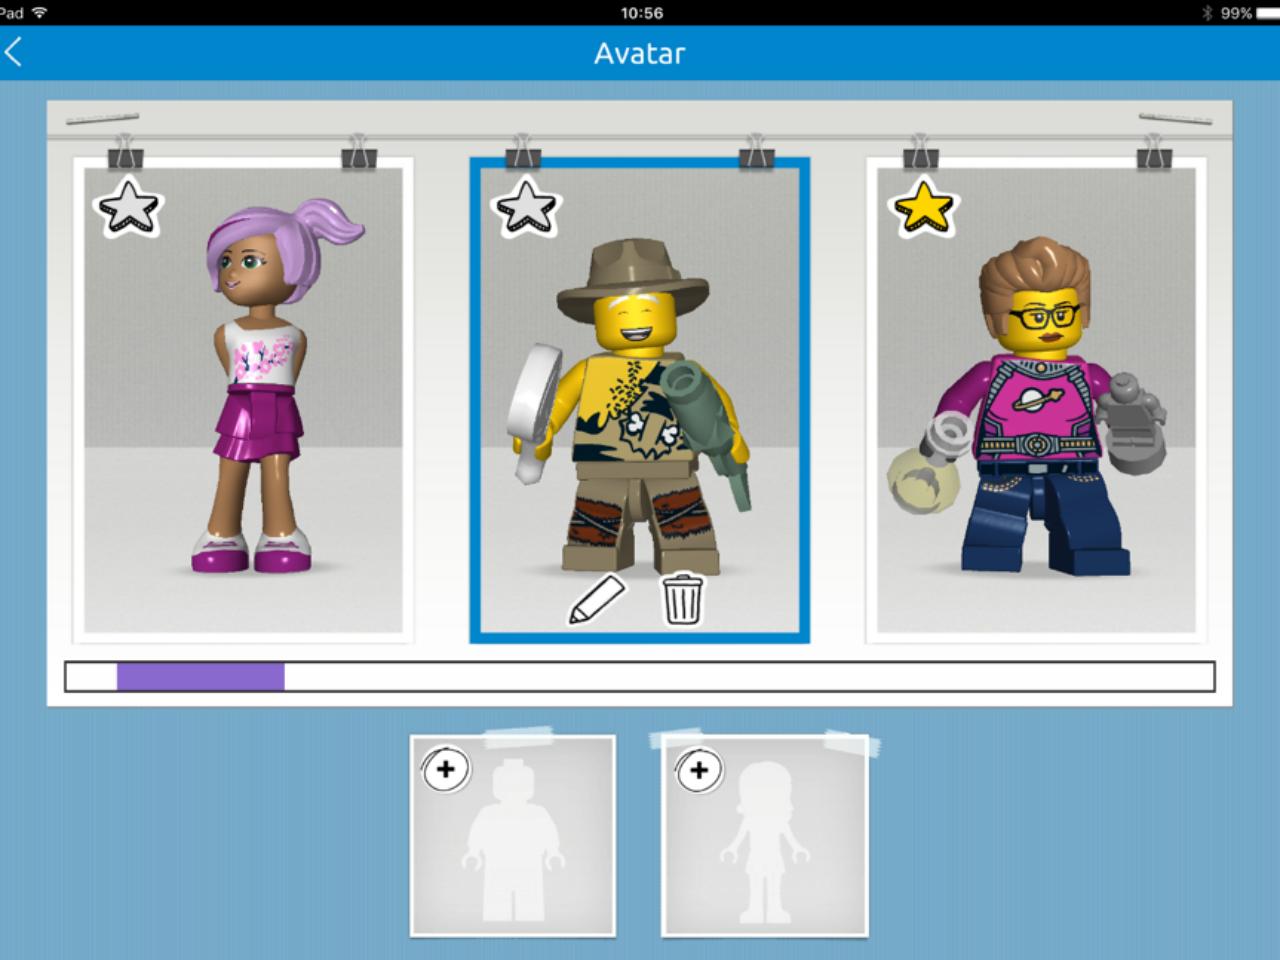 lego-life-app-avatars-1280x960